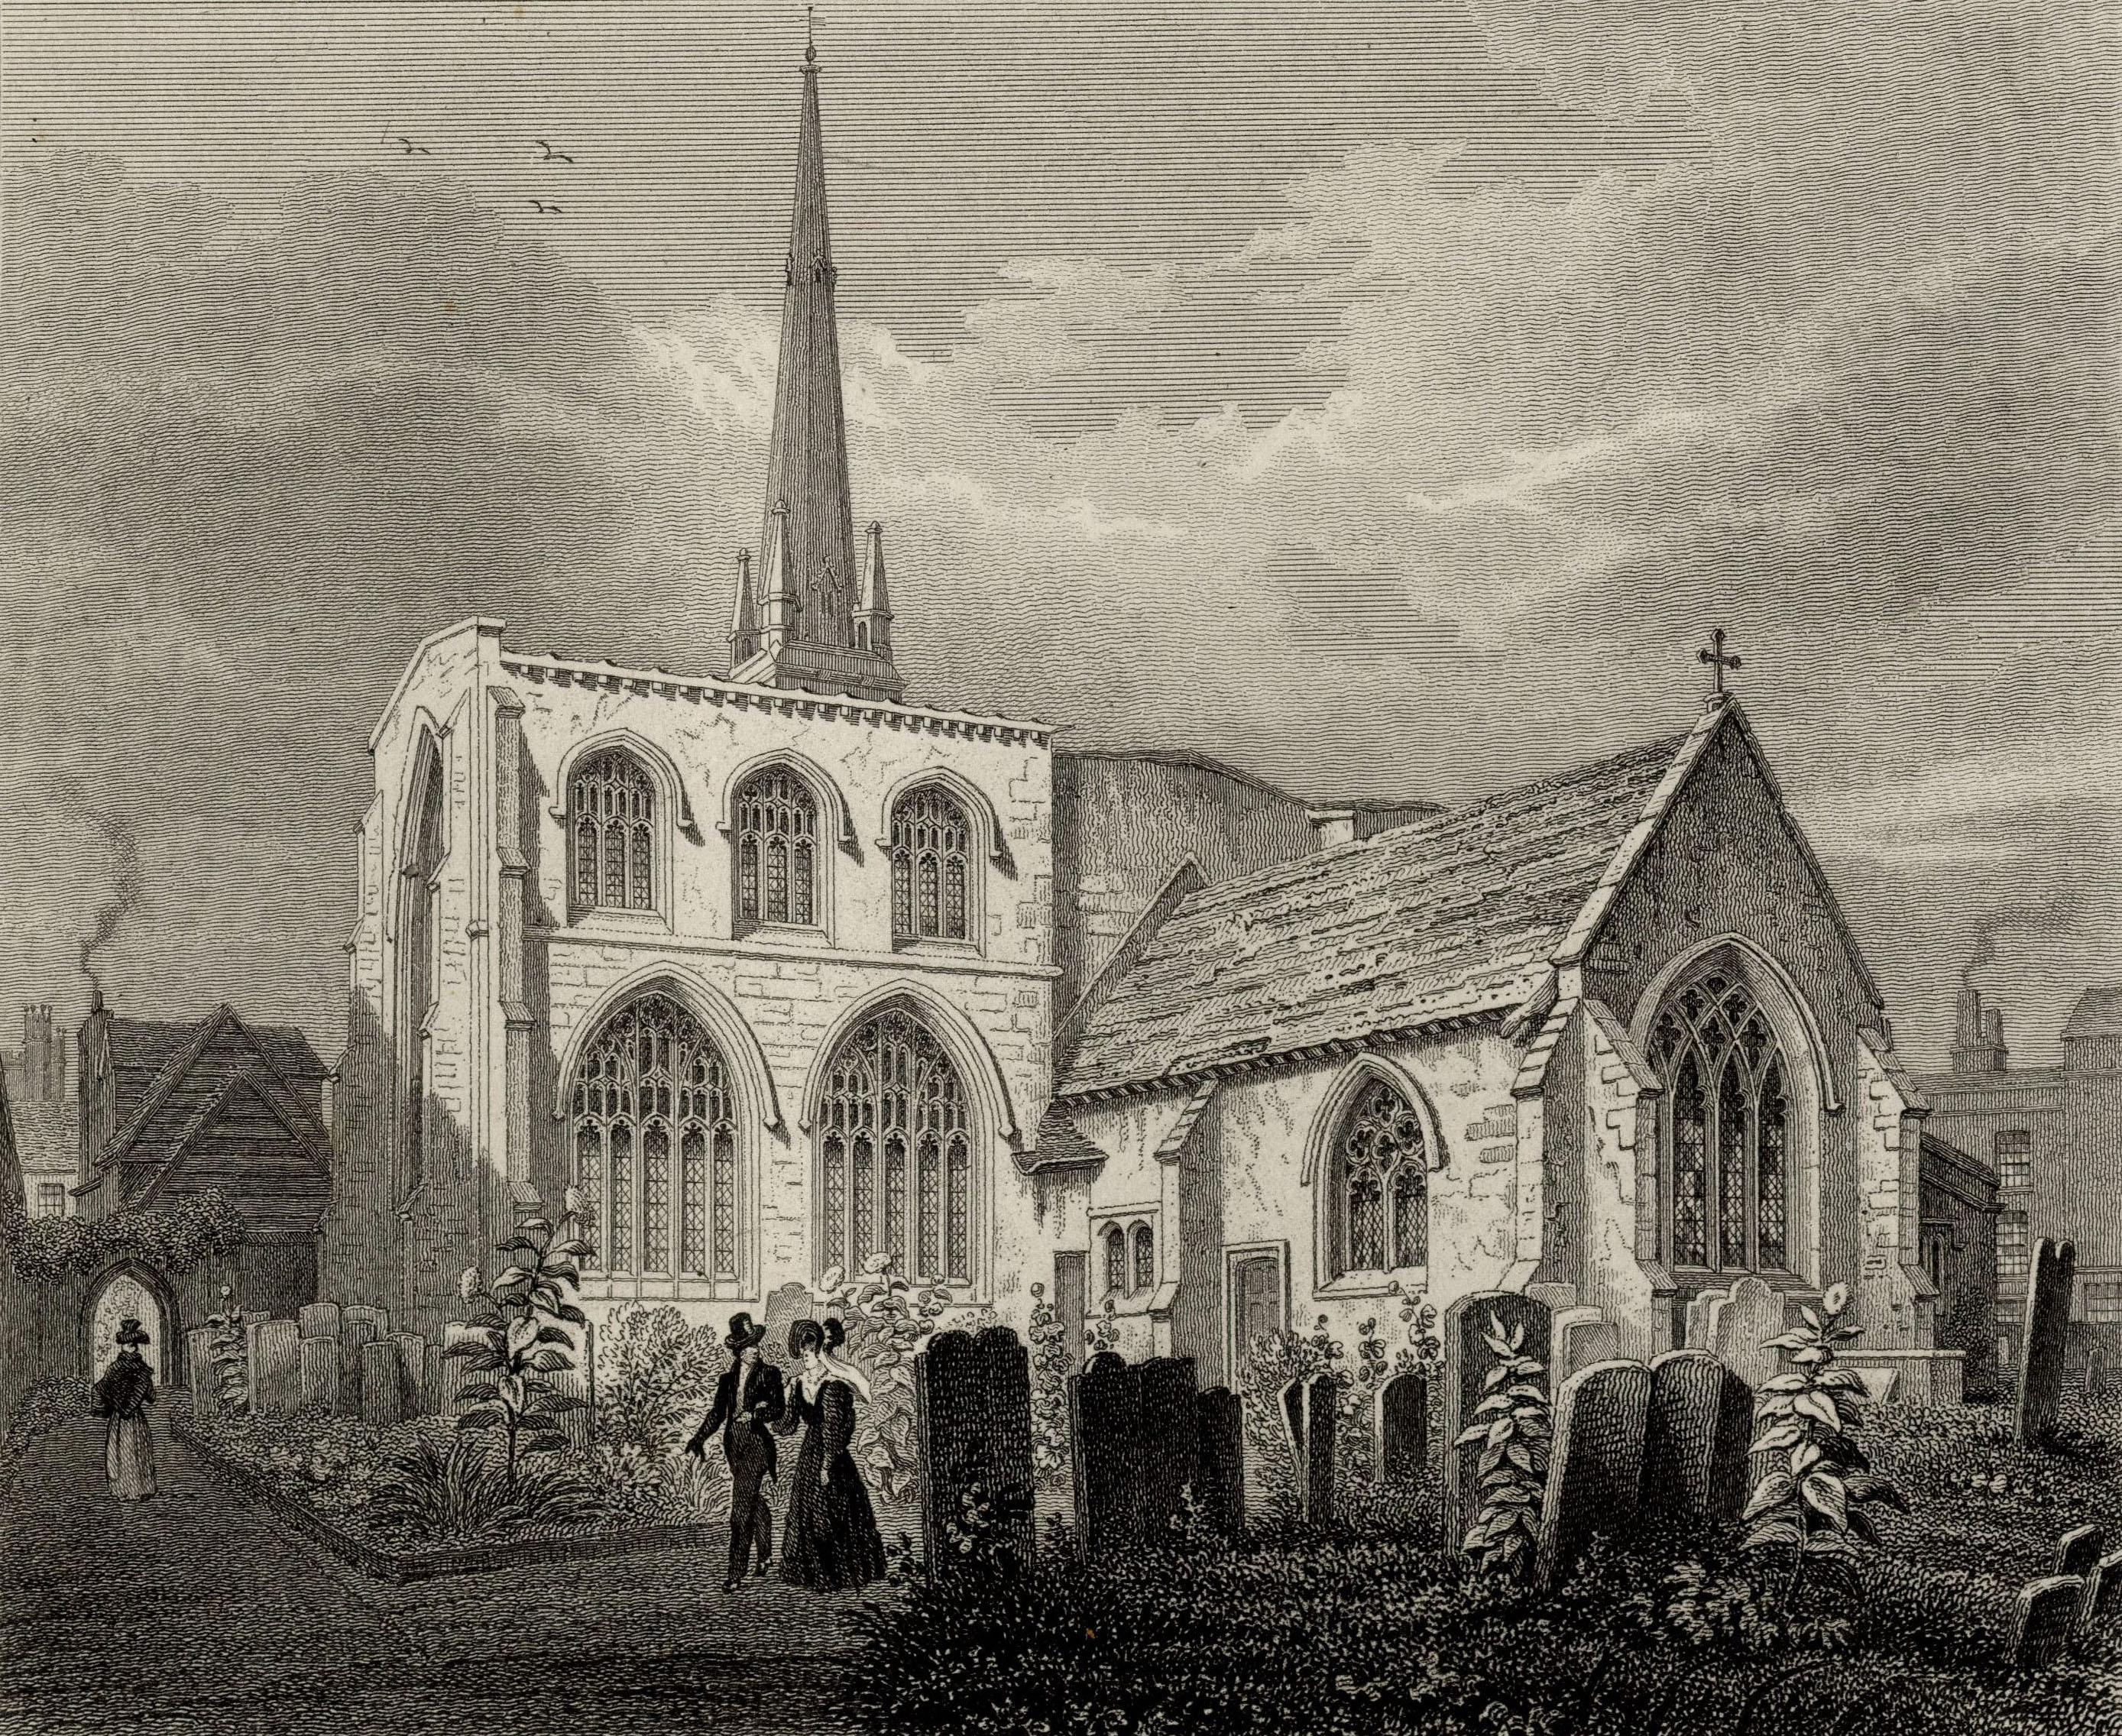 Holy Trinity Church, exterior. (Cooper's Memorials: Trinity exterior vol 3 p.382)